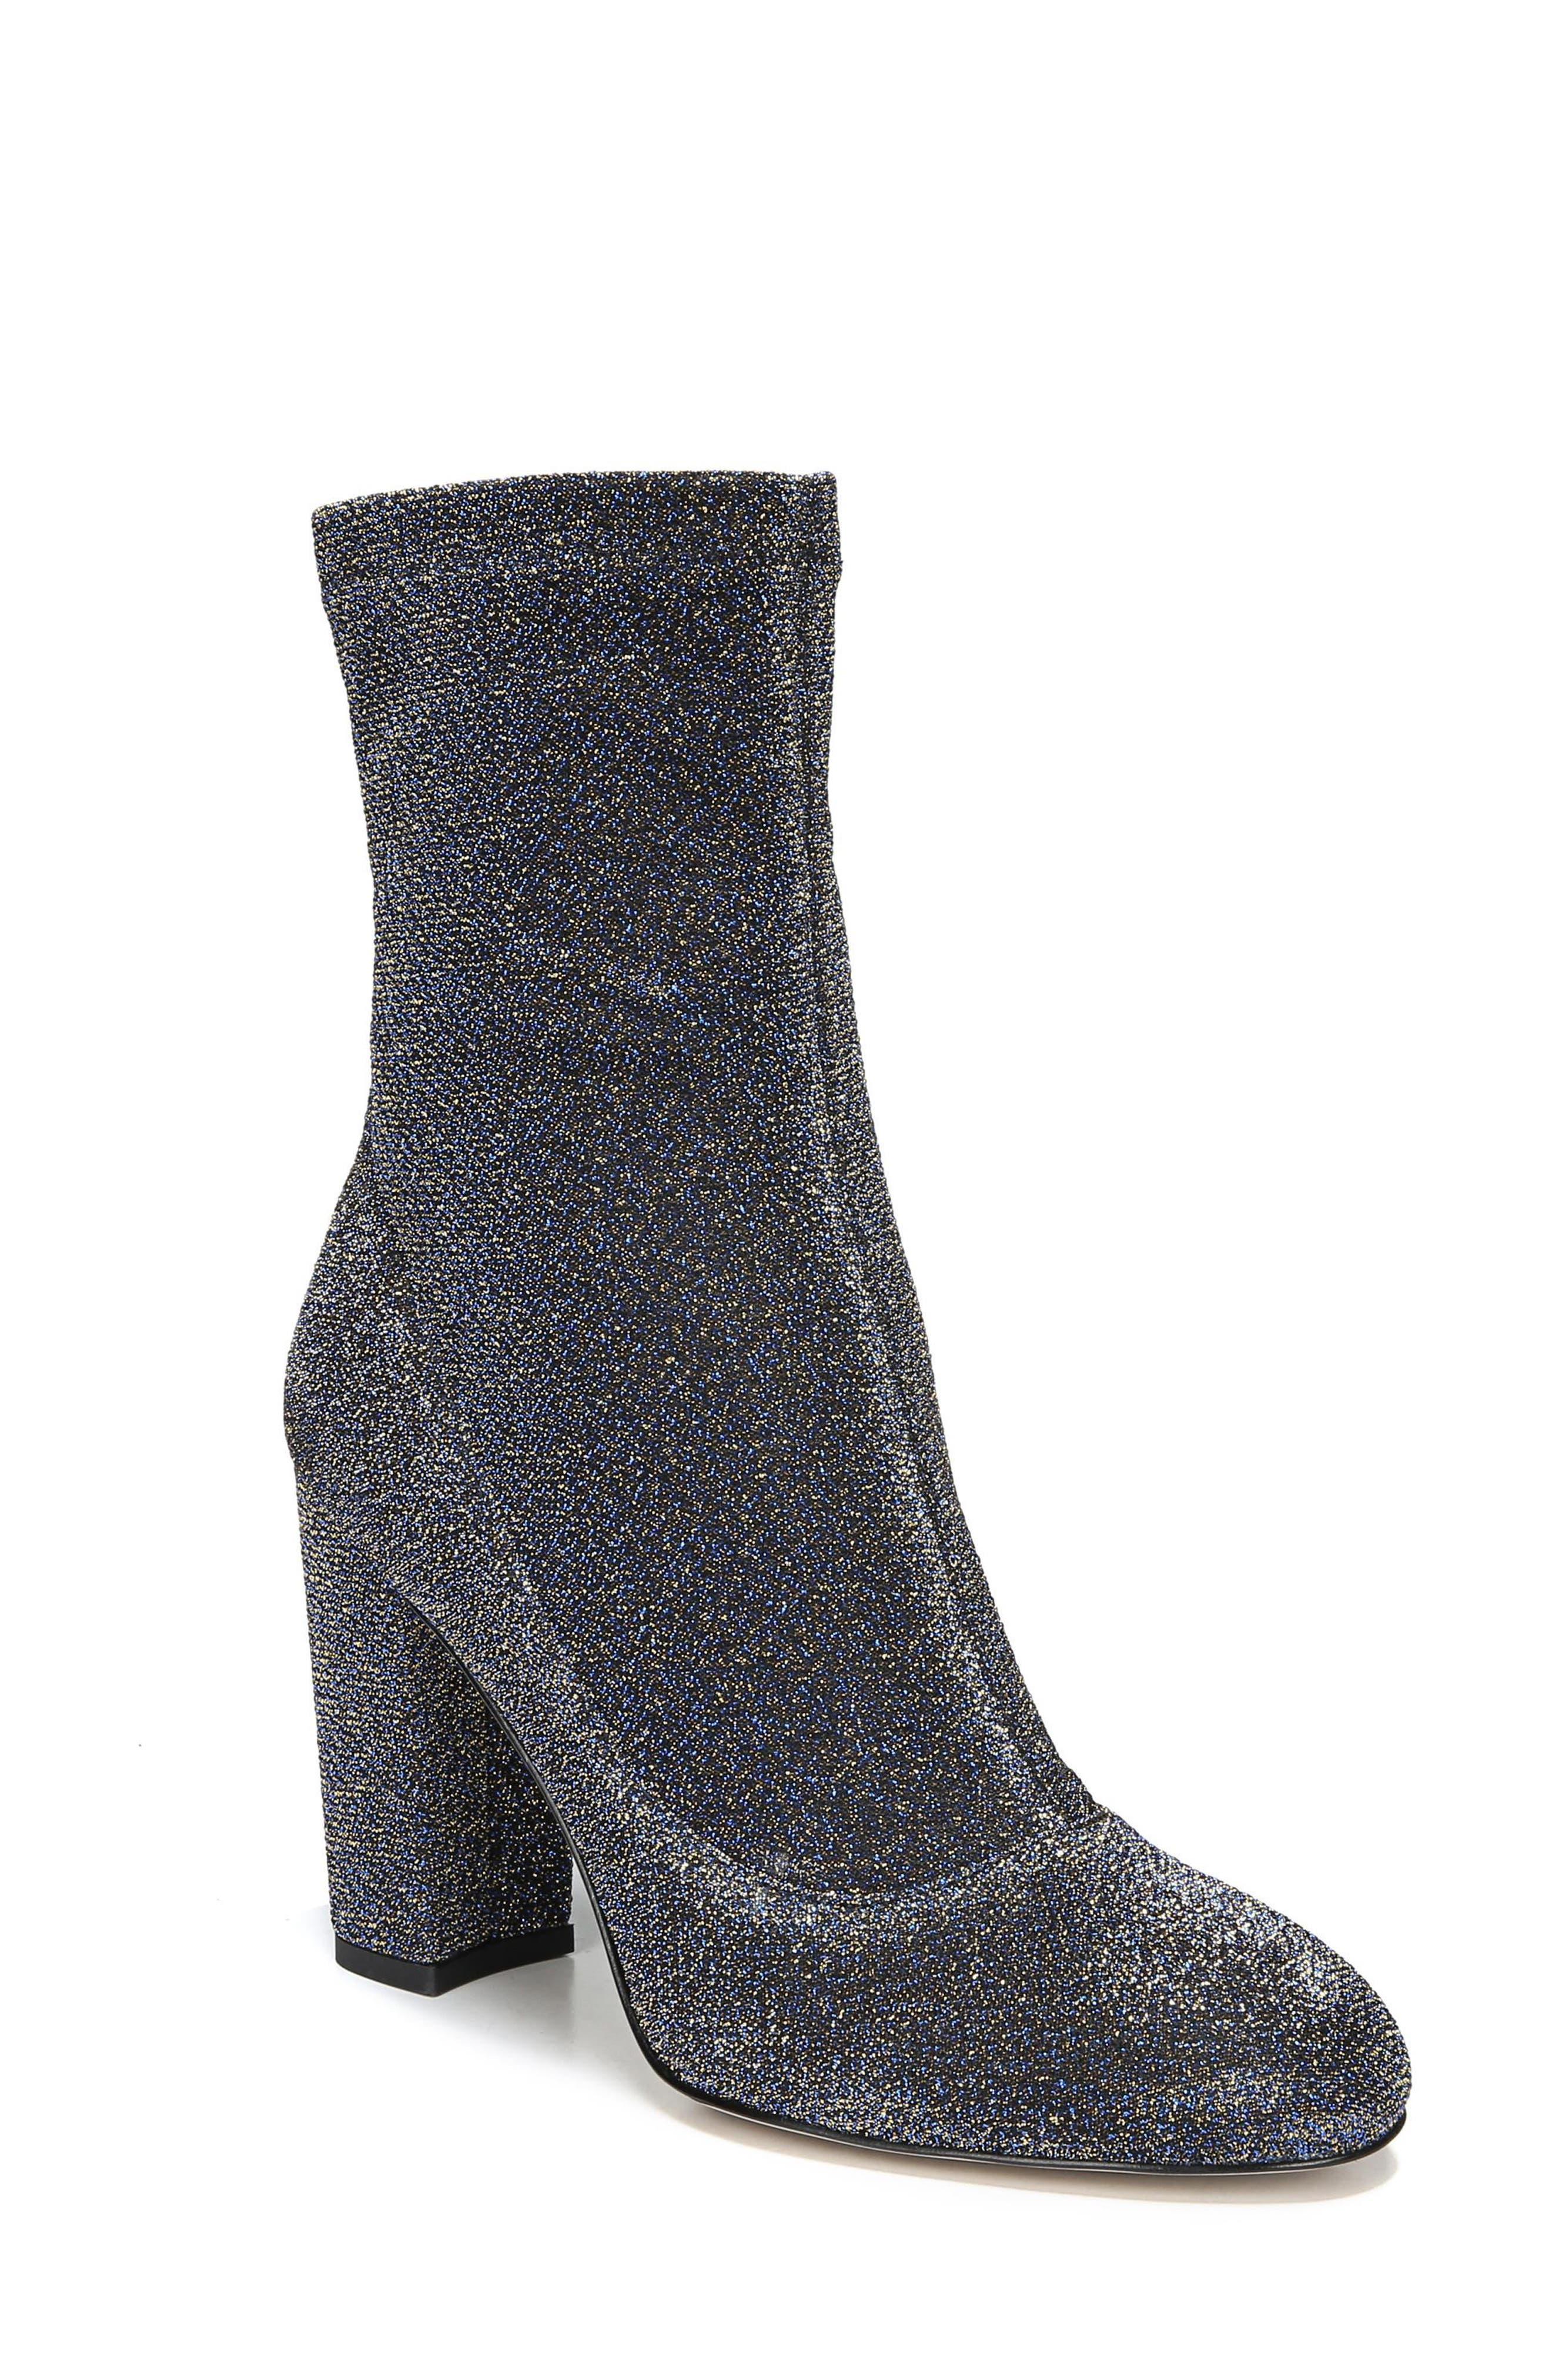 Alternate Image 1 Selected - Sam Edelman Calexa Sock Bootie (Women)